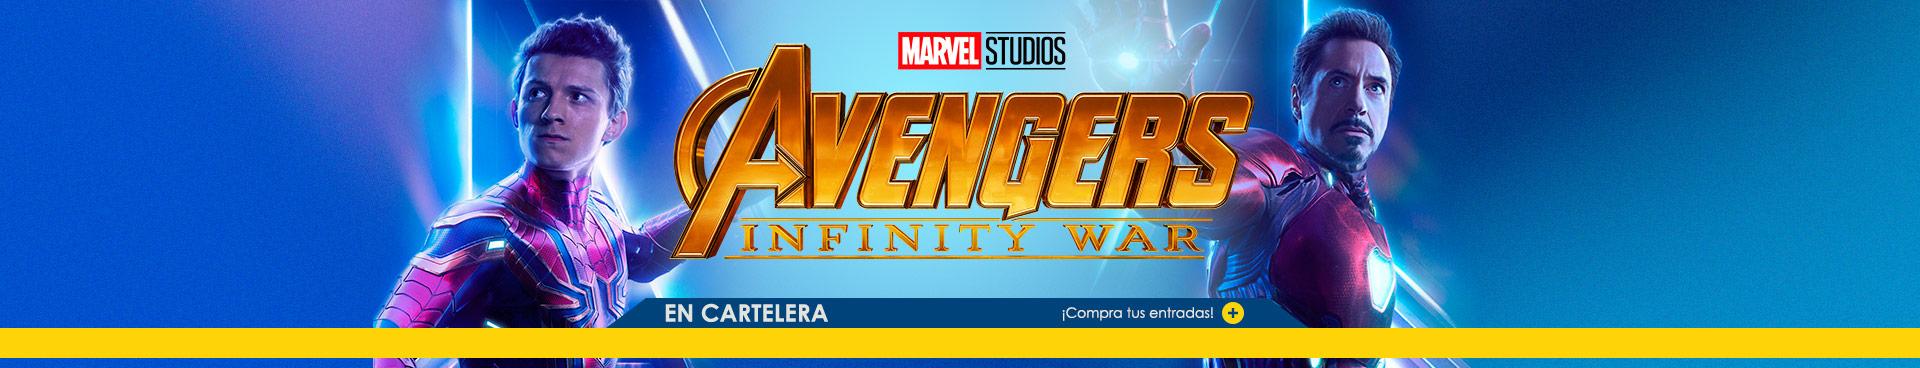 En cartelera Avengers